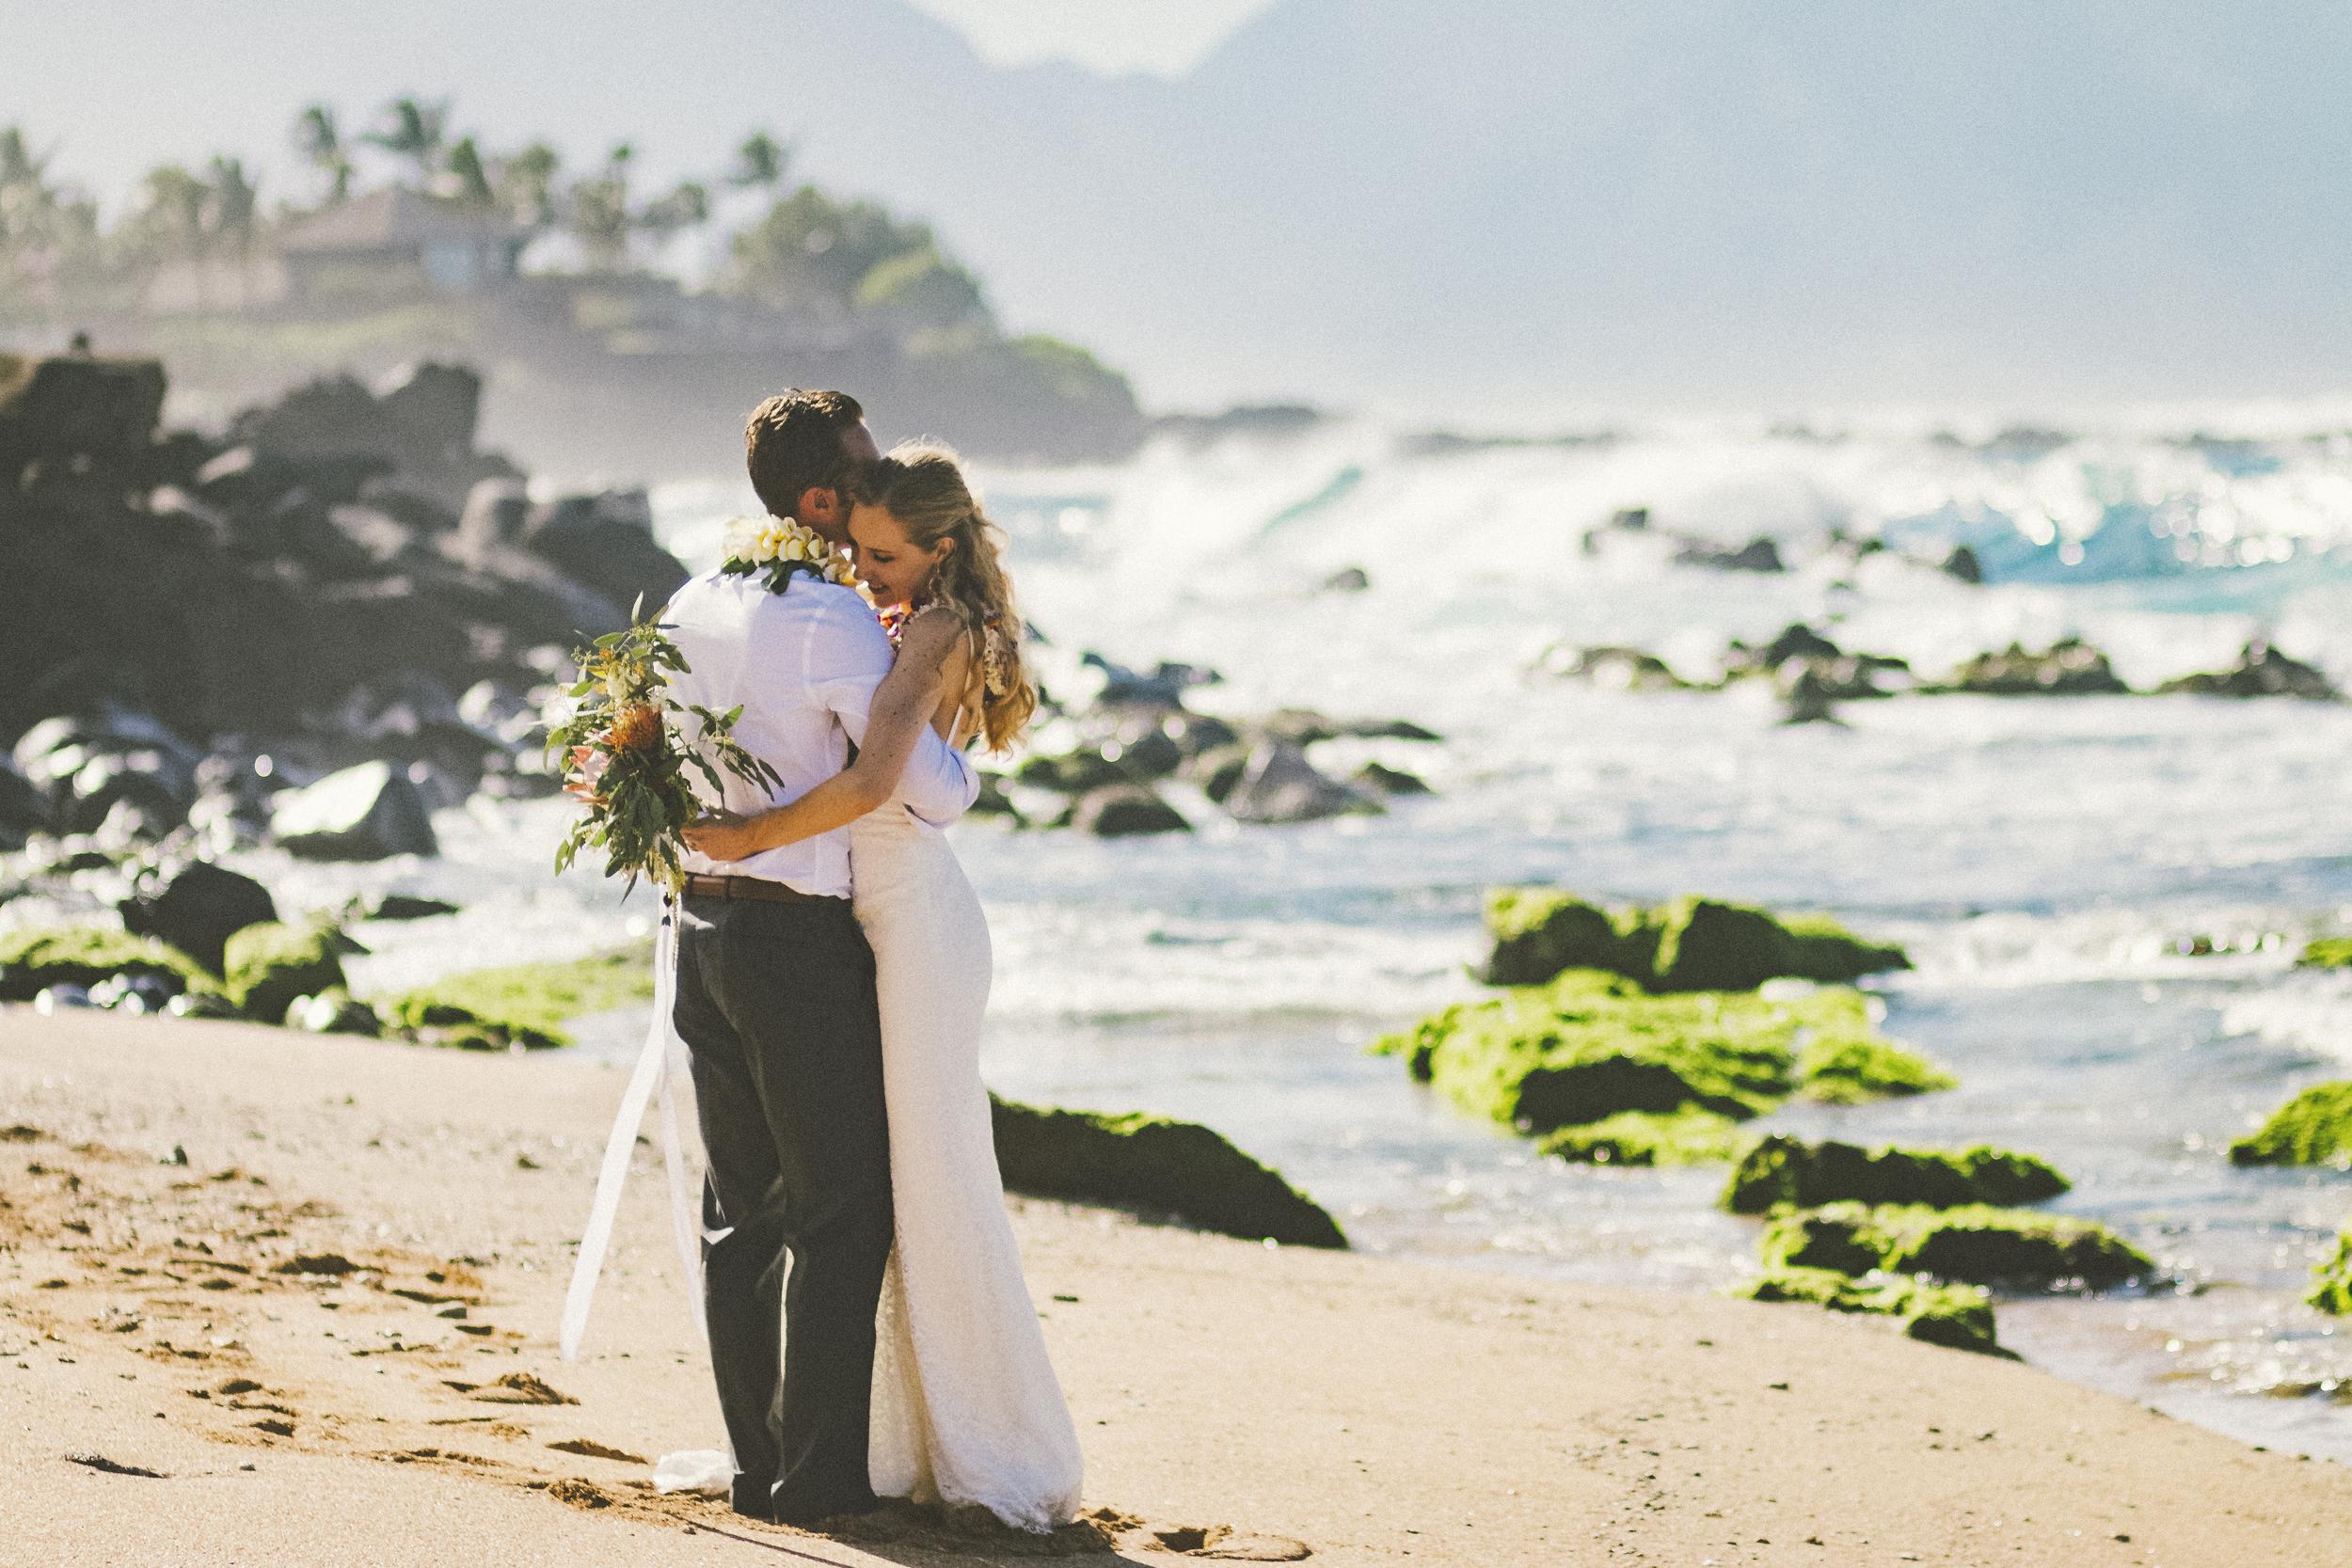 angie-diaz-photography-maui-wedding-71.jpg